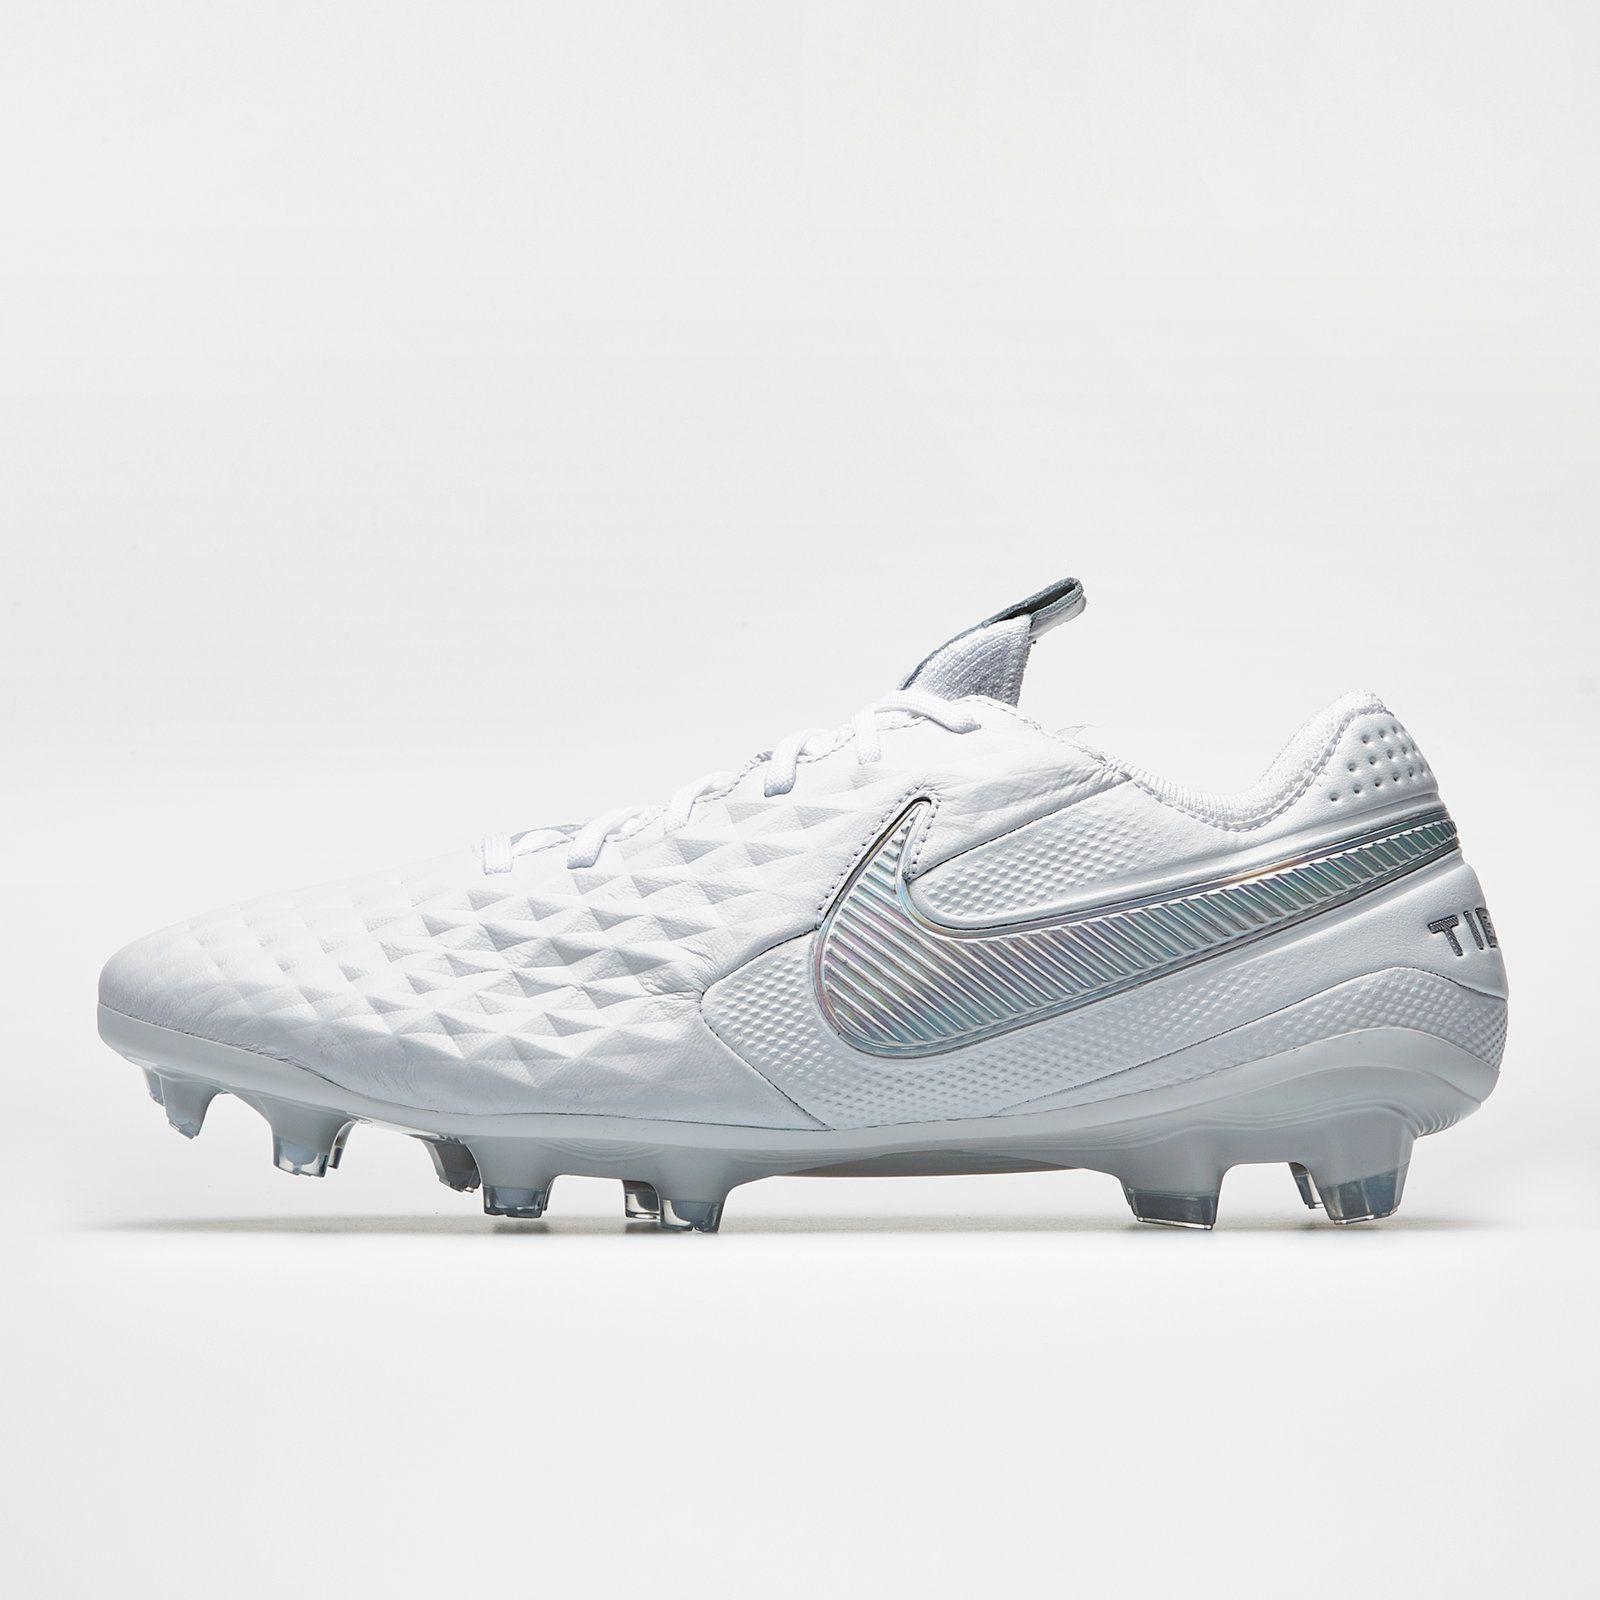 Nike Tiempo Legend Viii Elite Fg Nuovo White White Metallic Platinum Football Boots Mens Football Boots Football